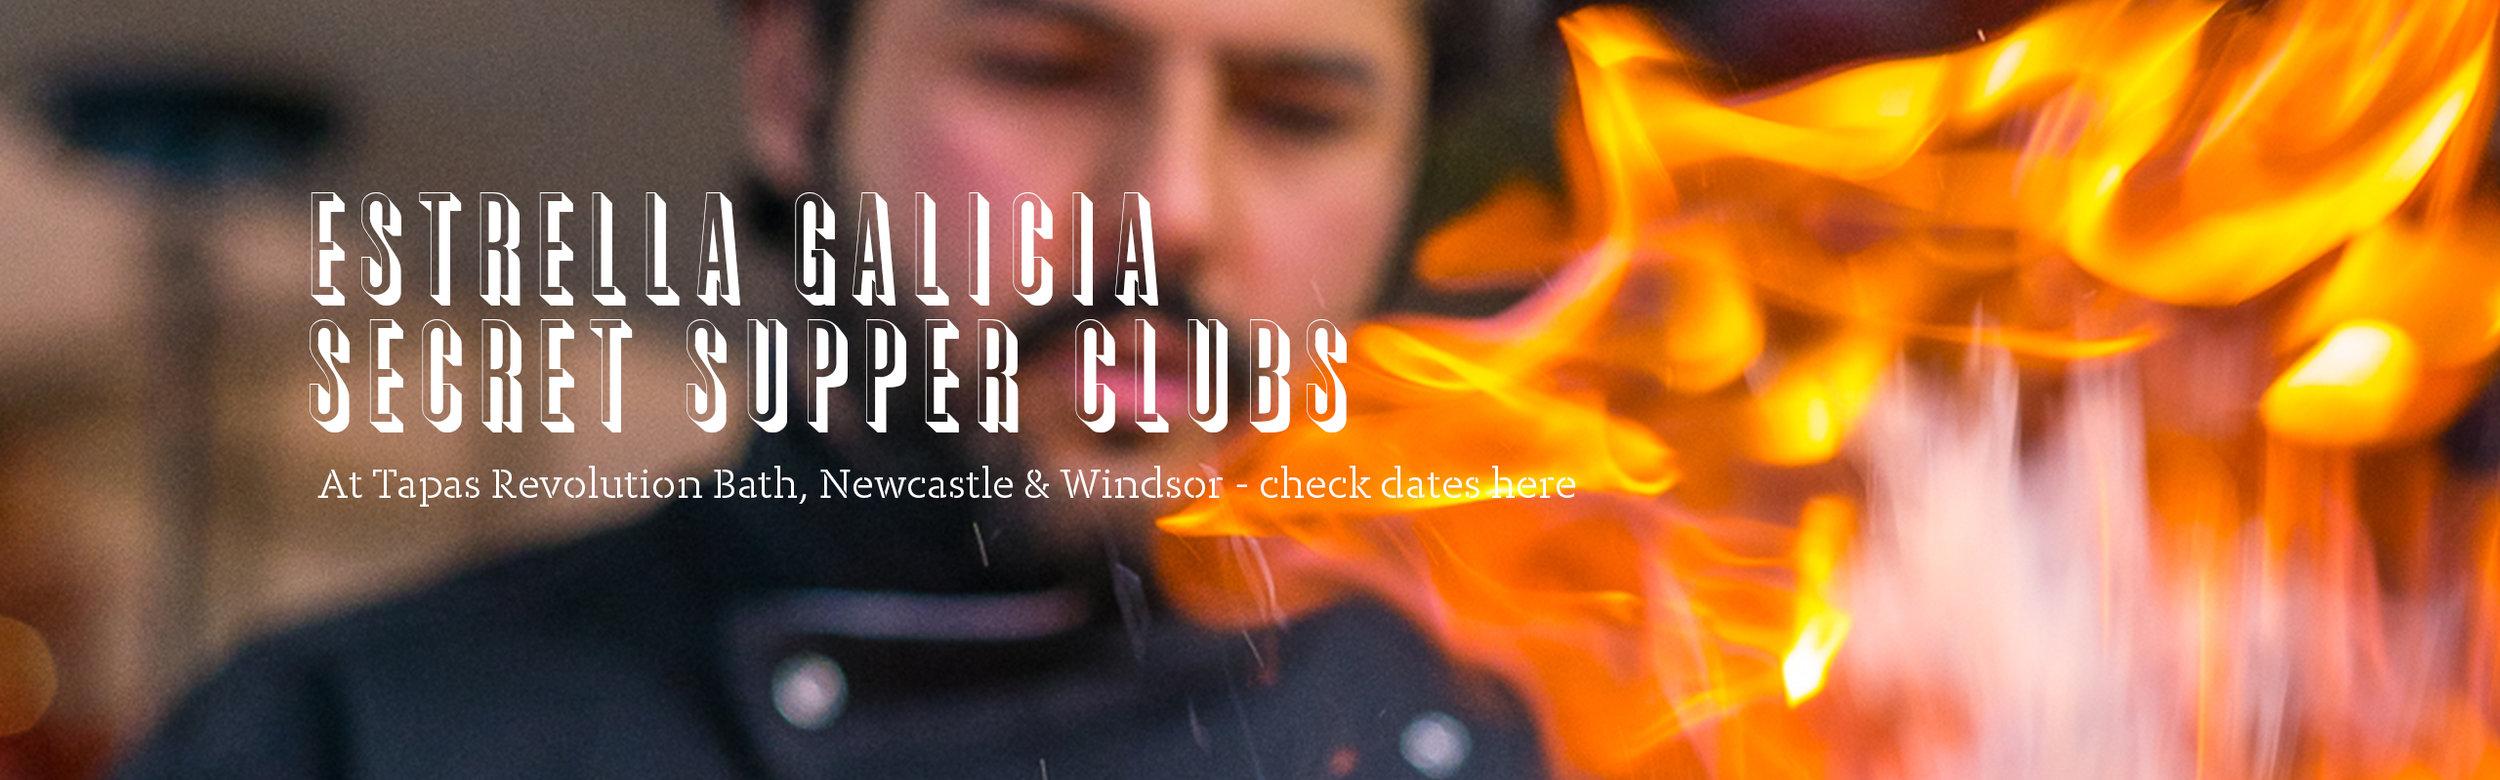 SupperClub-Home-Banner.jpg